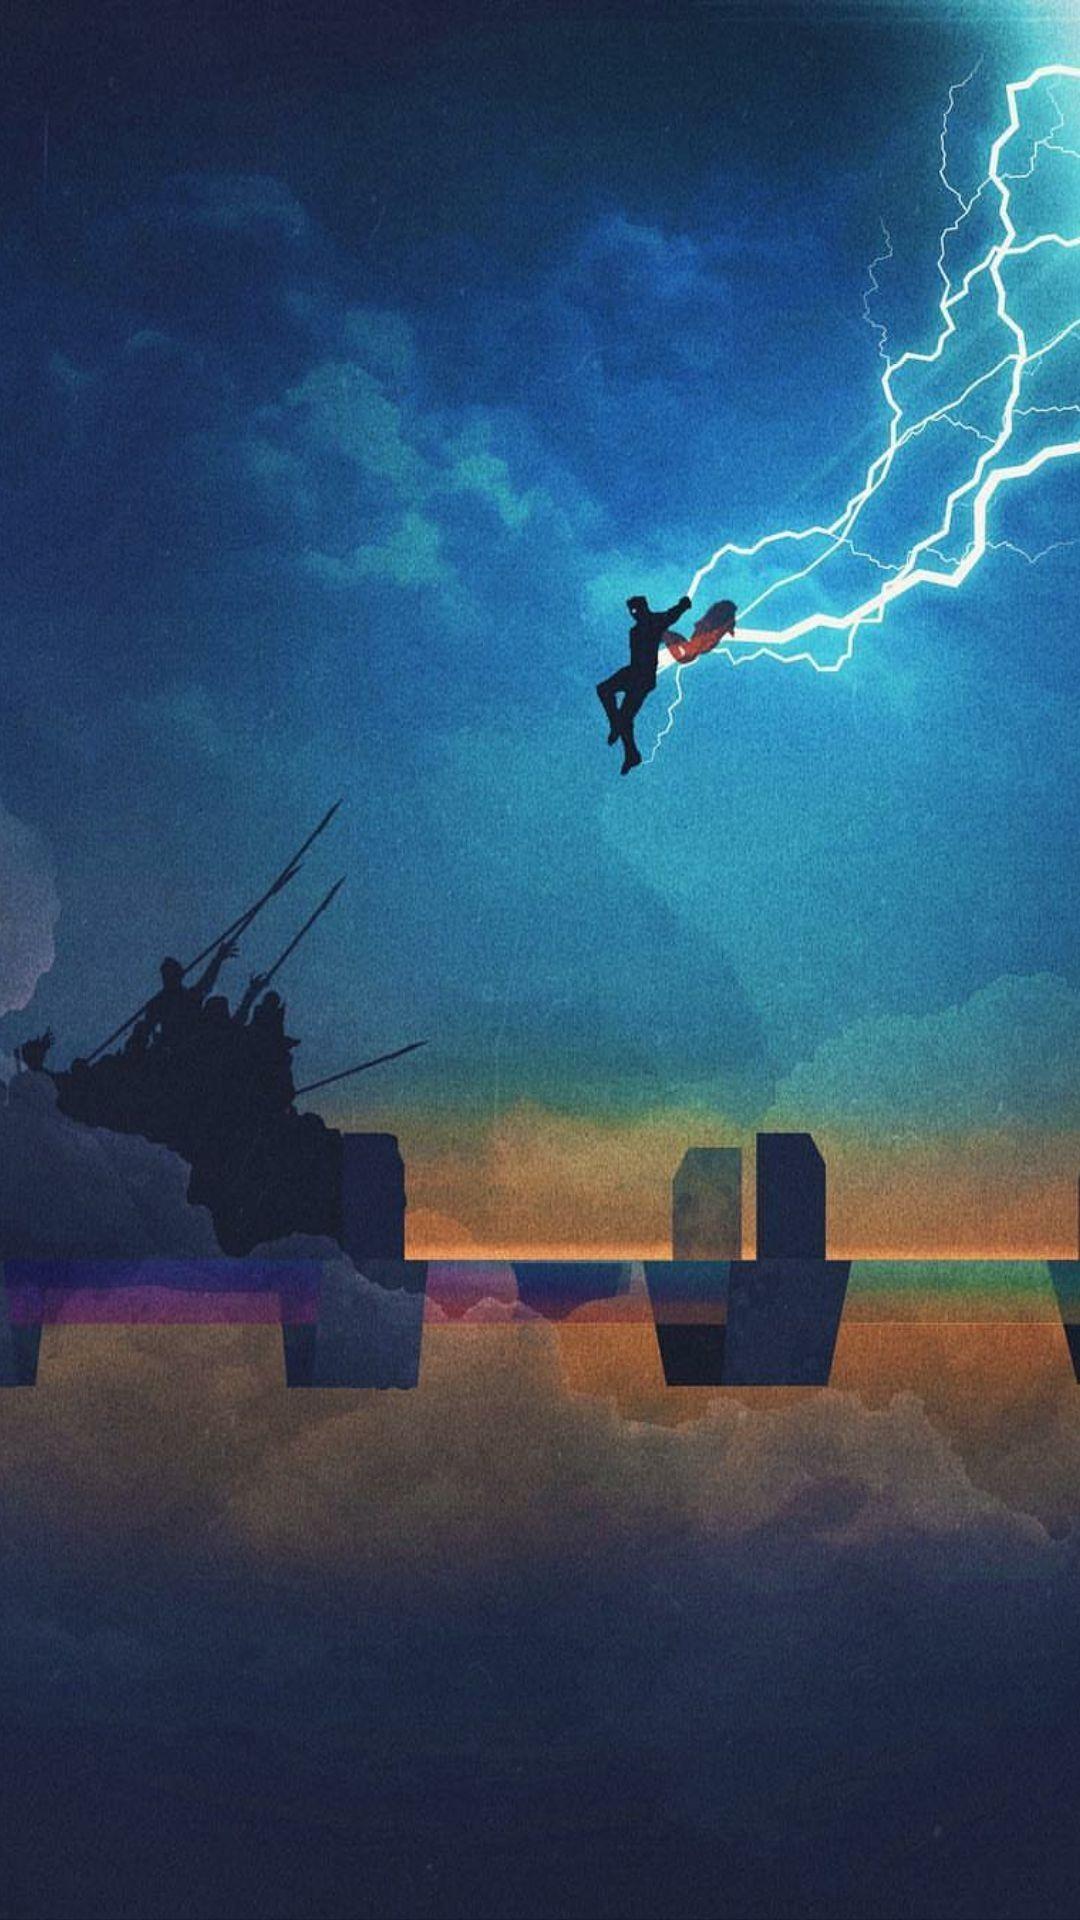 Look At My Little Baby Flying Across The Bifrost Like A Little Thunderous Angel Marvel Wallpaper Thor Wallpaper Marvel Thor